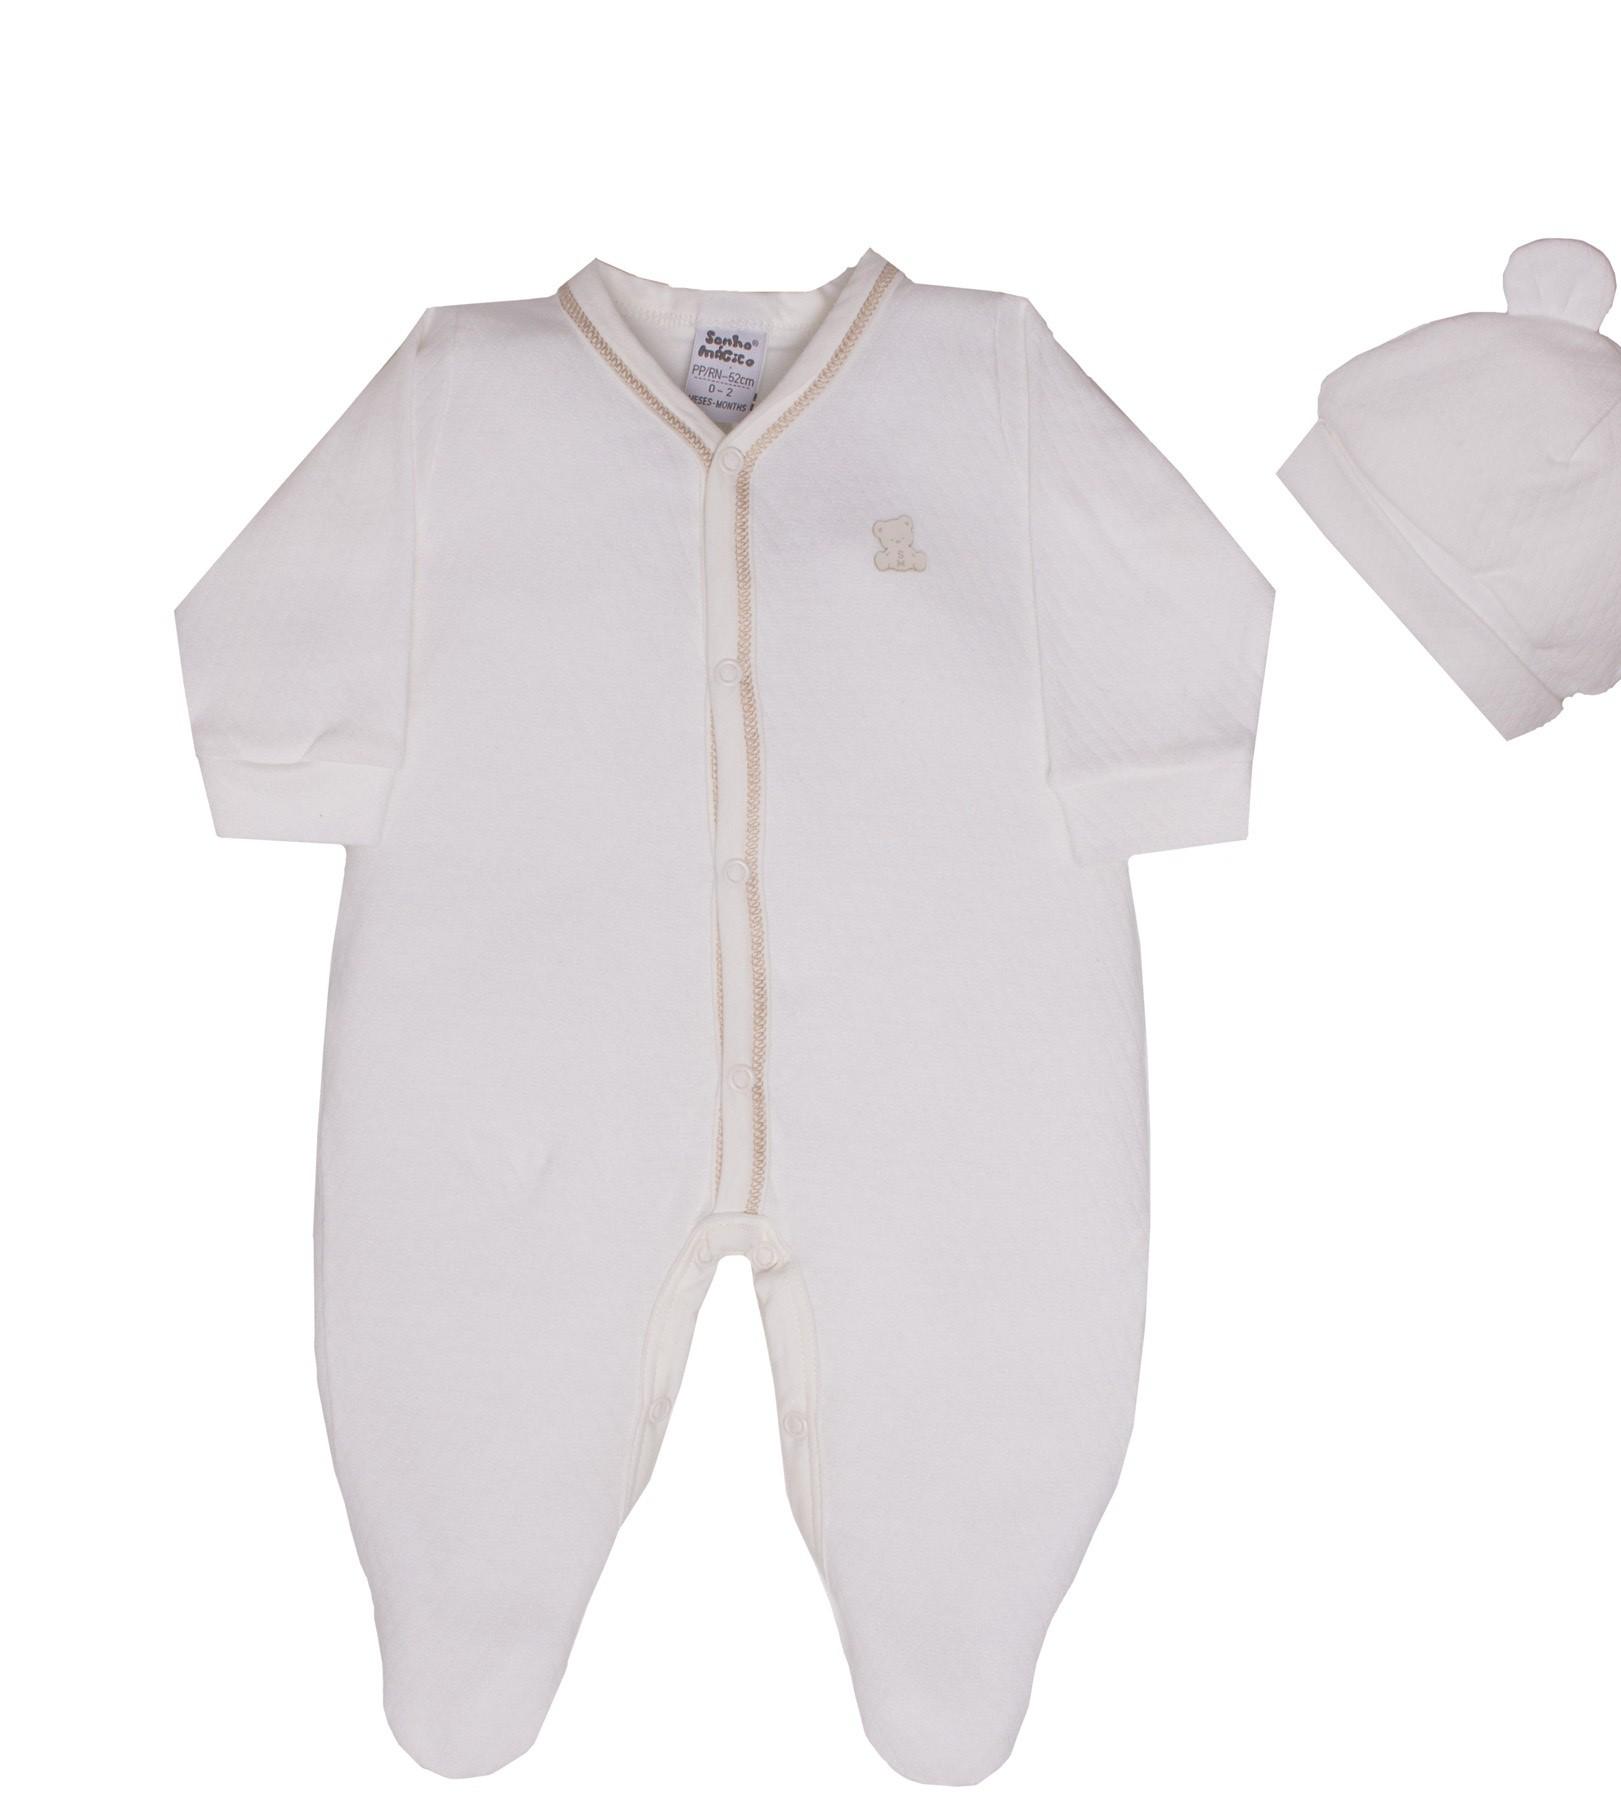 Macacão Longo Malha Neutro Baby Bear 2PCS Sonho Mágico